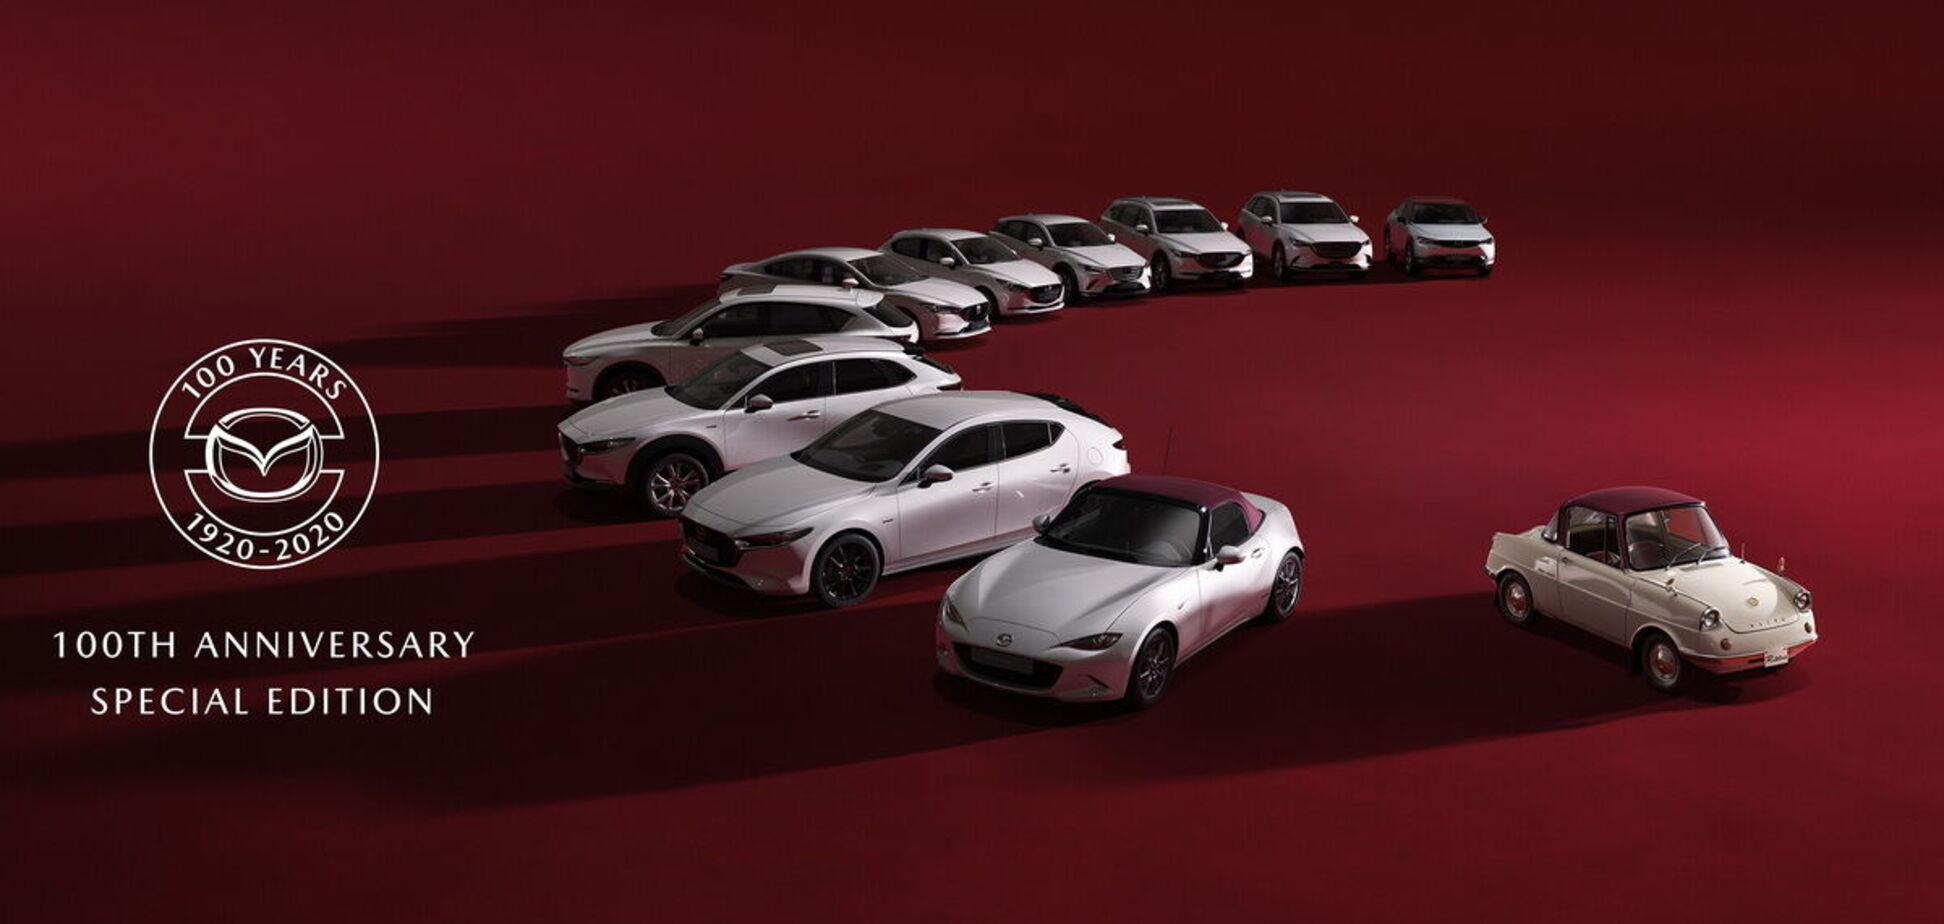 Mazda выпустит лимитированную серию 100th Anniversary. Фото: newsroom.mazda.com